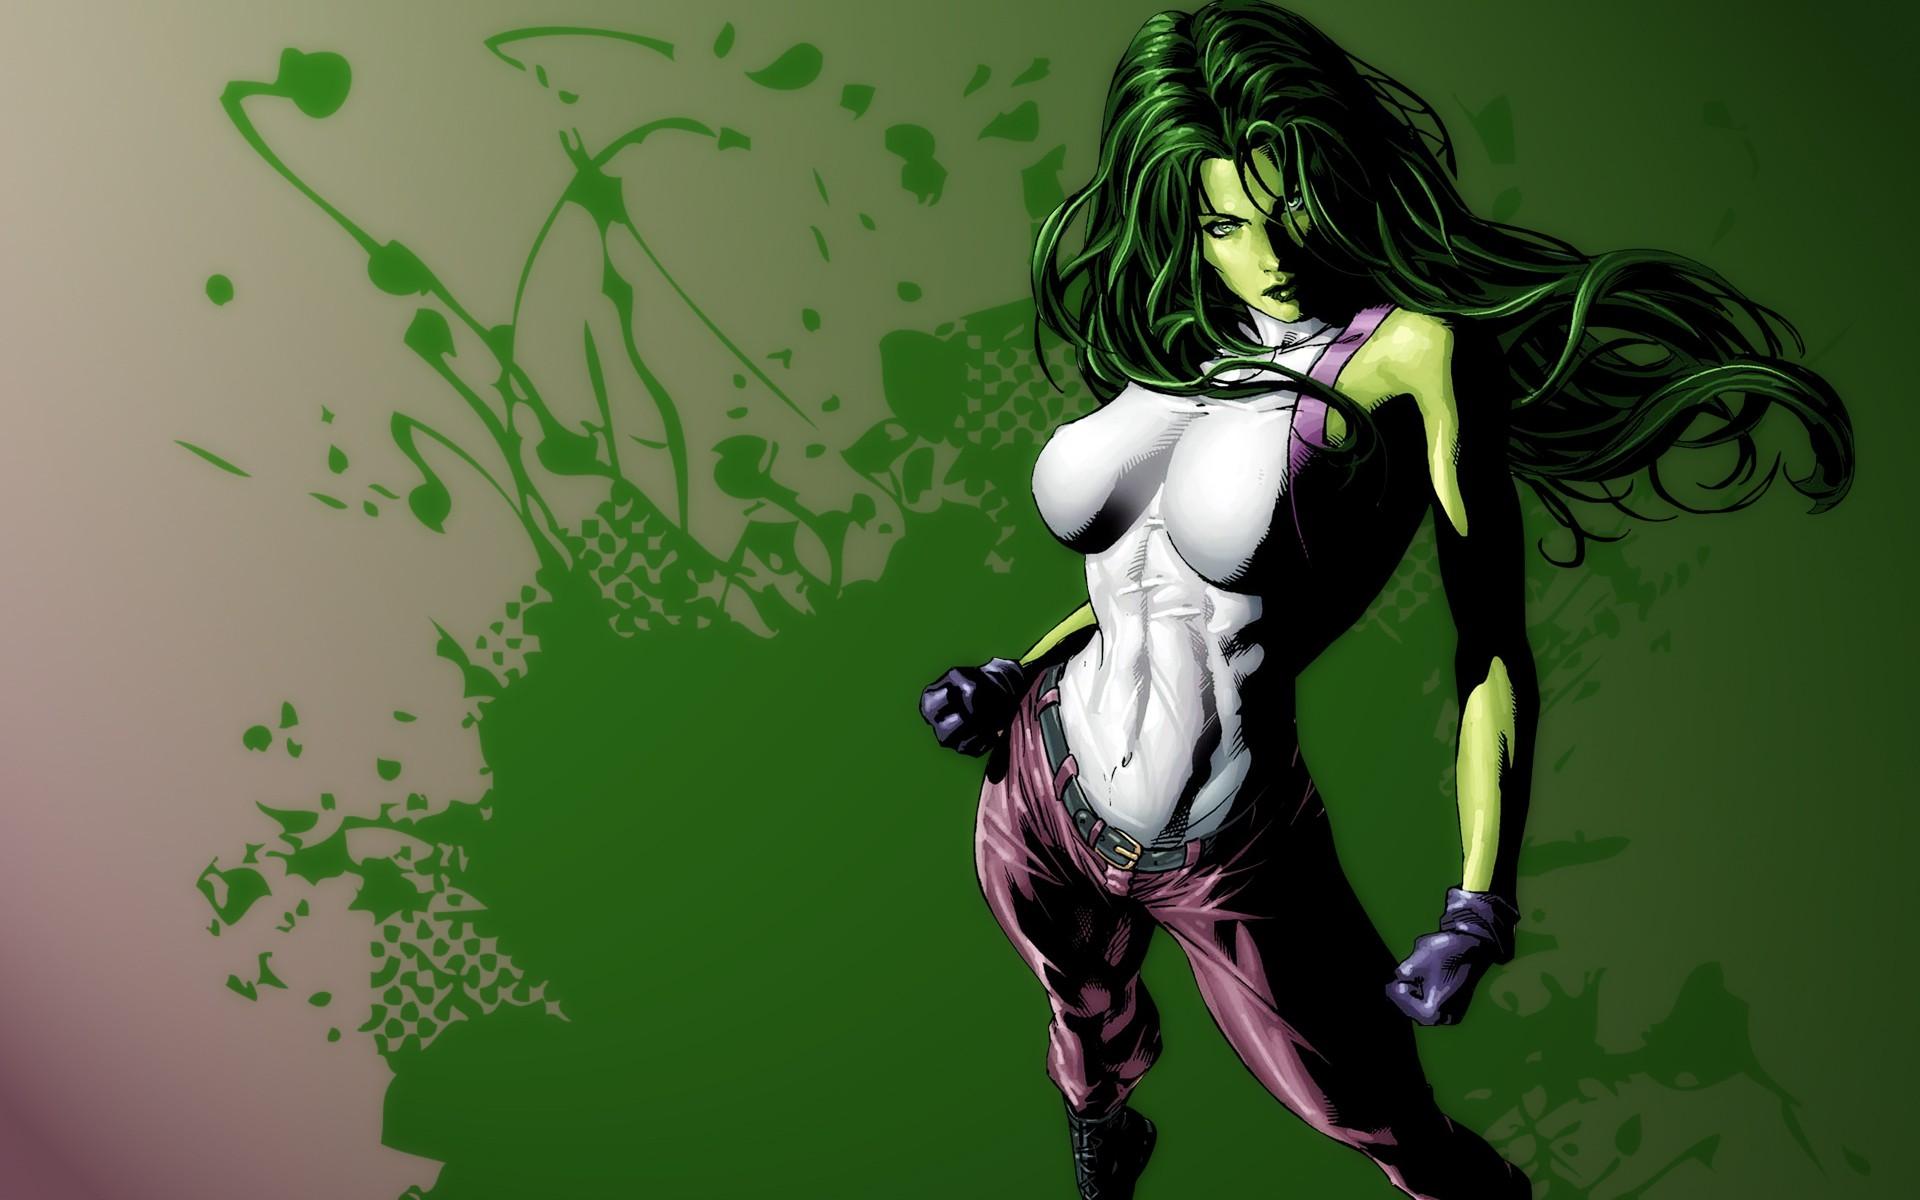 she-hulk-comics-1080p-wallpaper